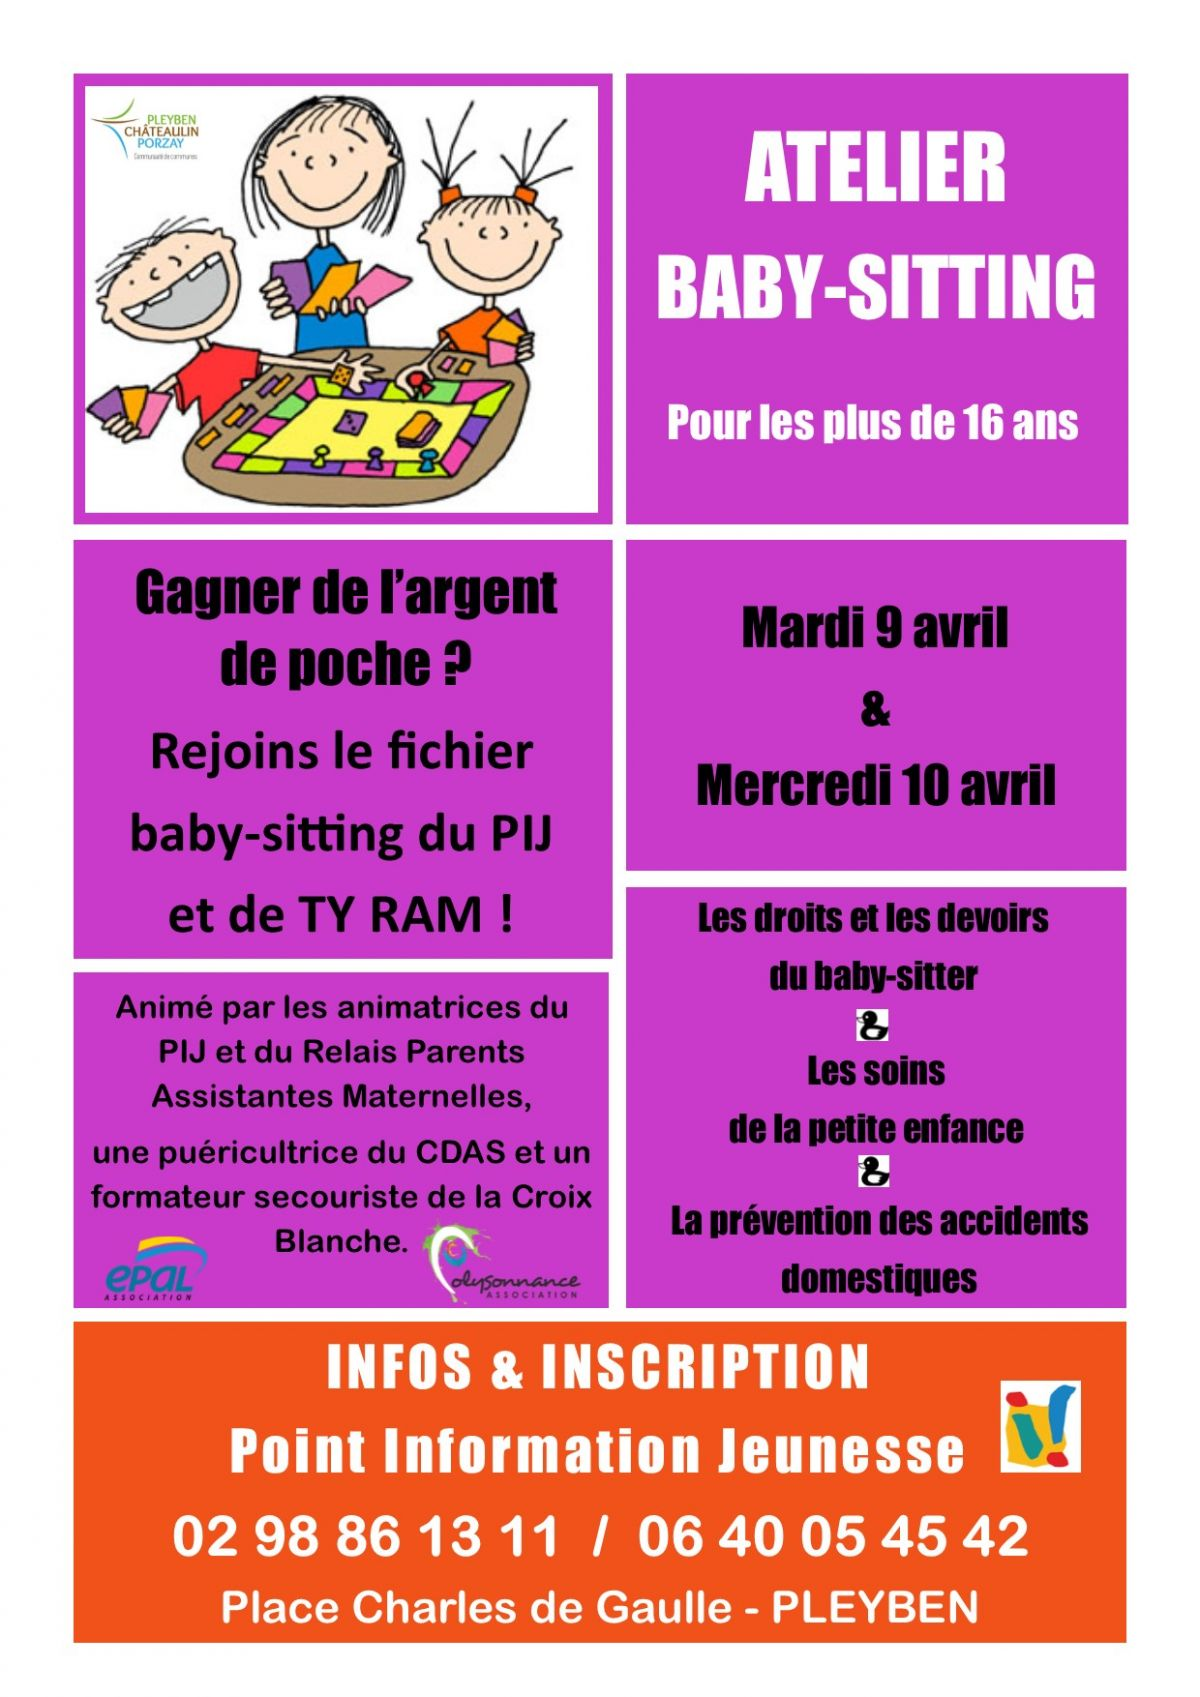 PIJ - 2019.04.09 - atelier Baby Sitting Pleyben 9 et 10 avril 2019